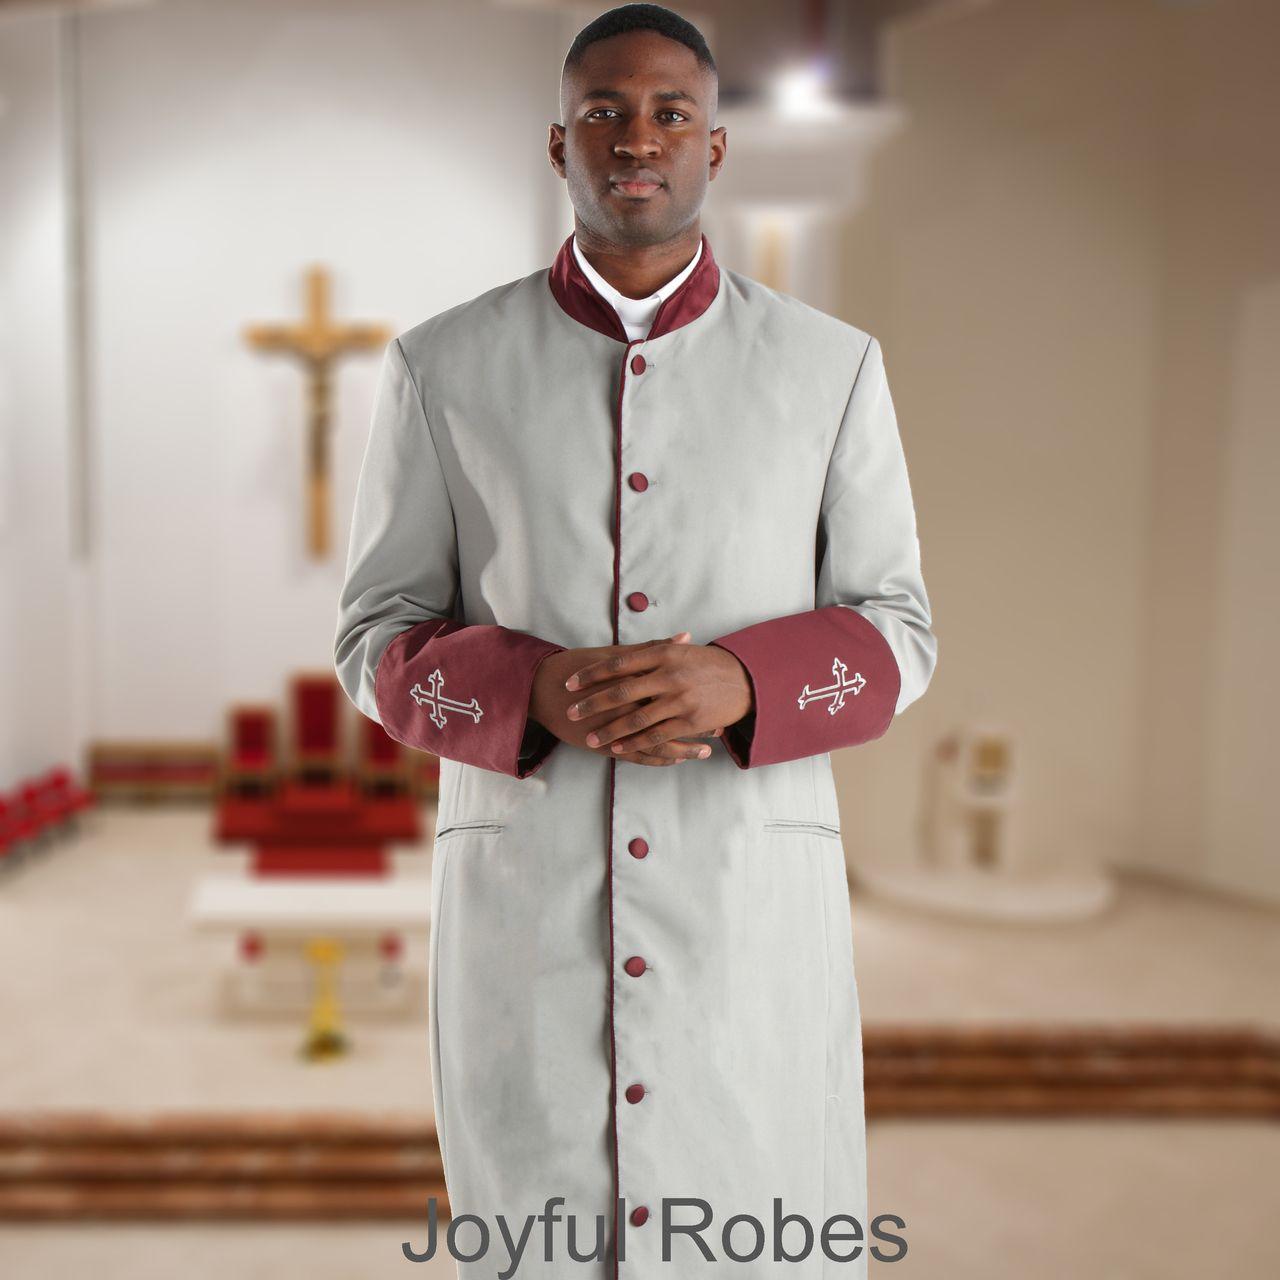 309 M. Men's Pastor/Clergy Robe - Grey/Maroon Cuff